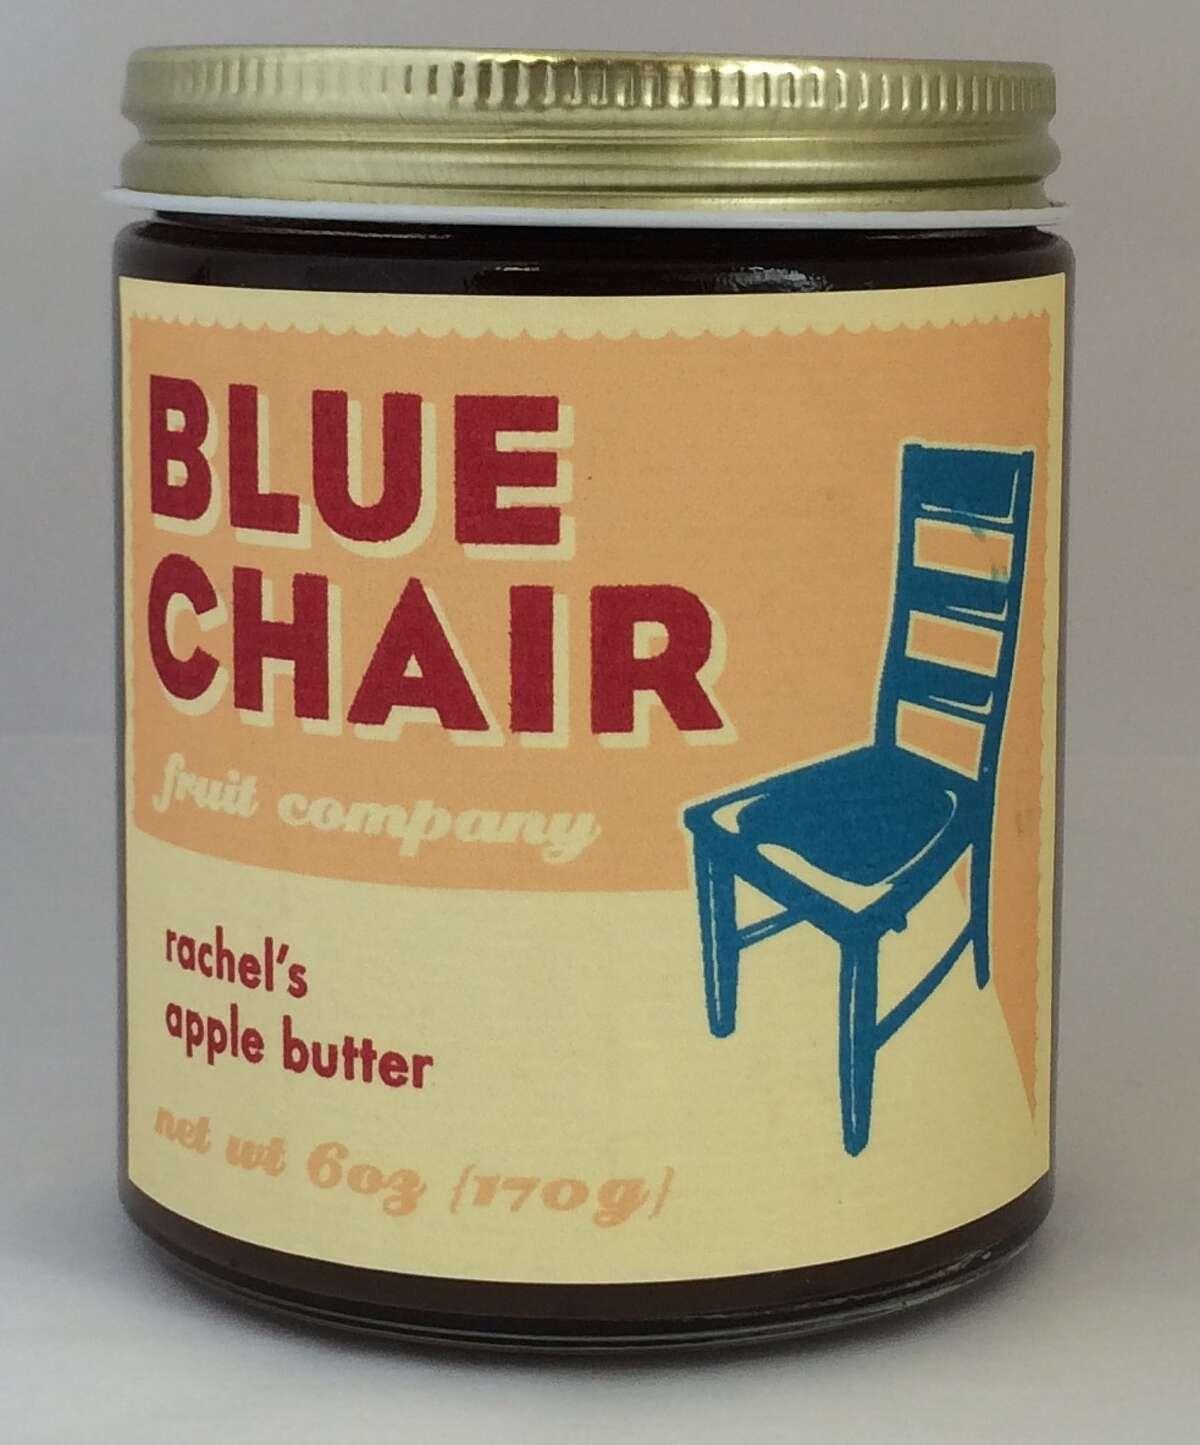 Rachel's Apple Butter from Blue Chair Fruit Company